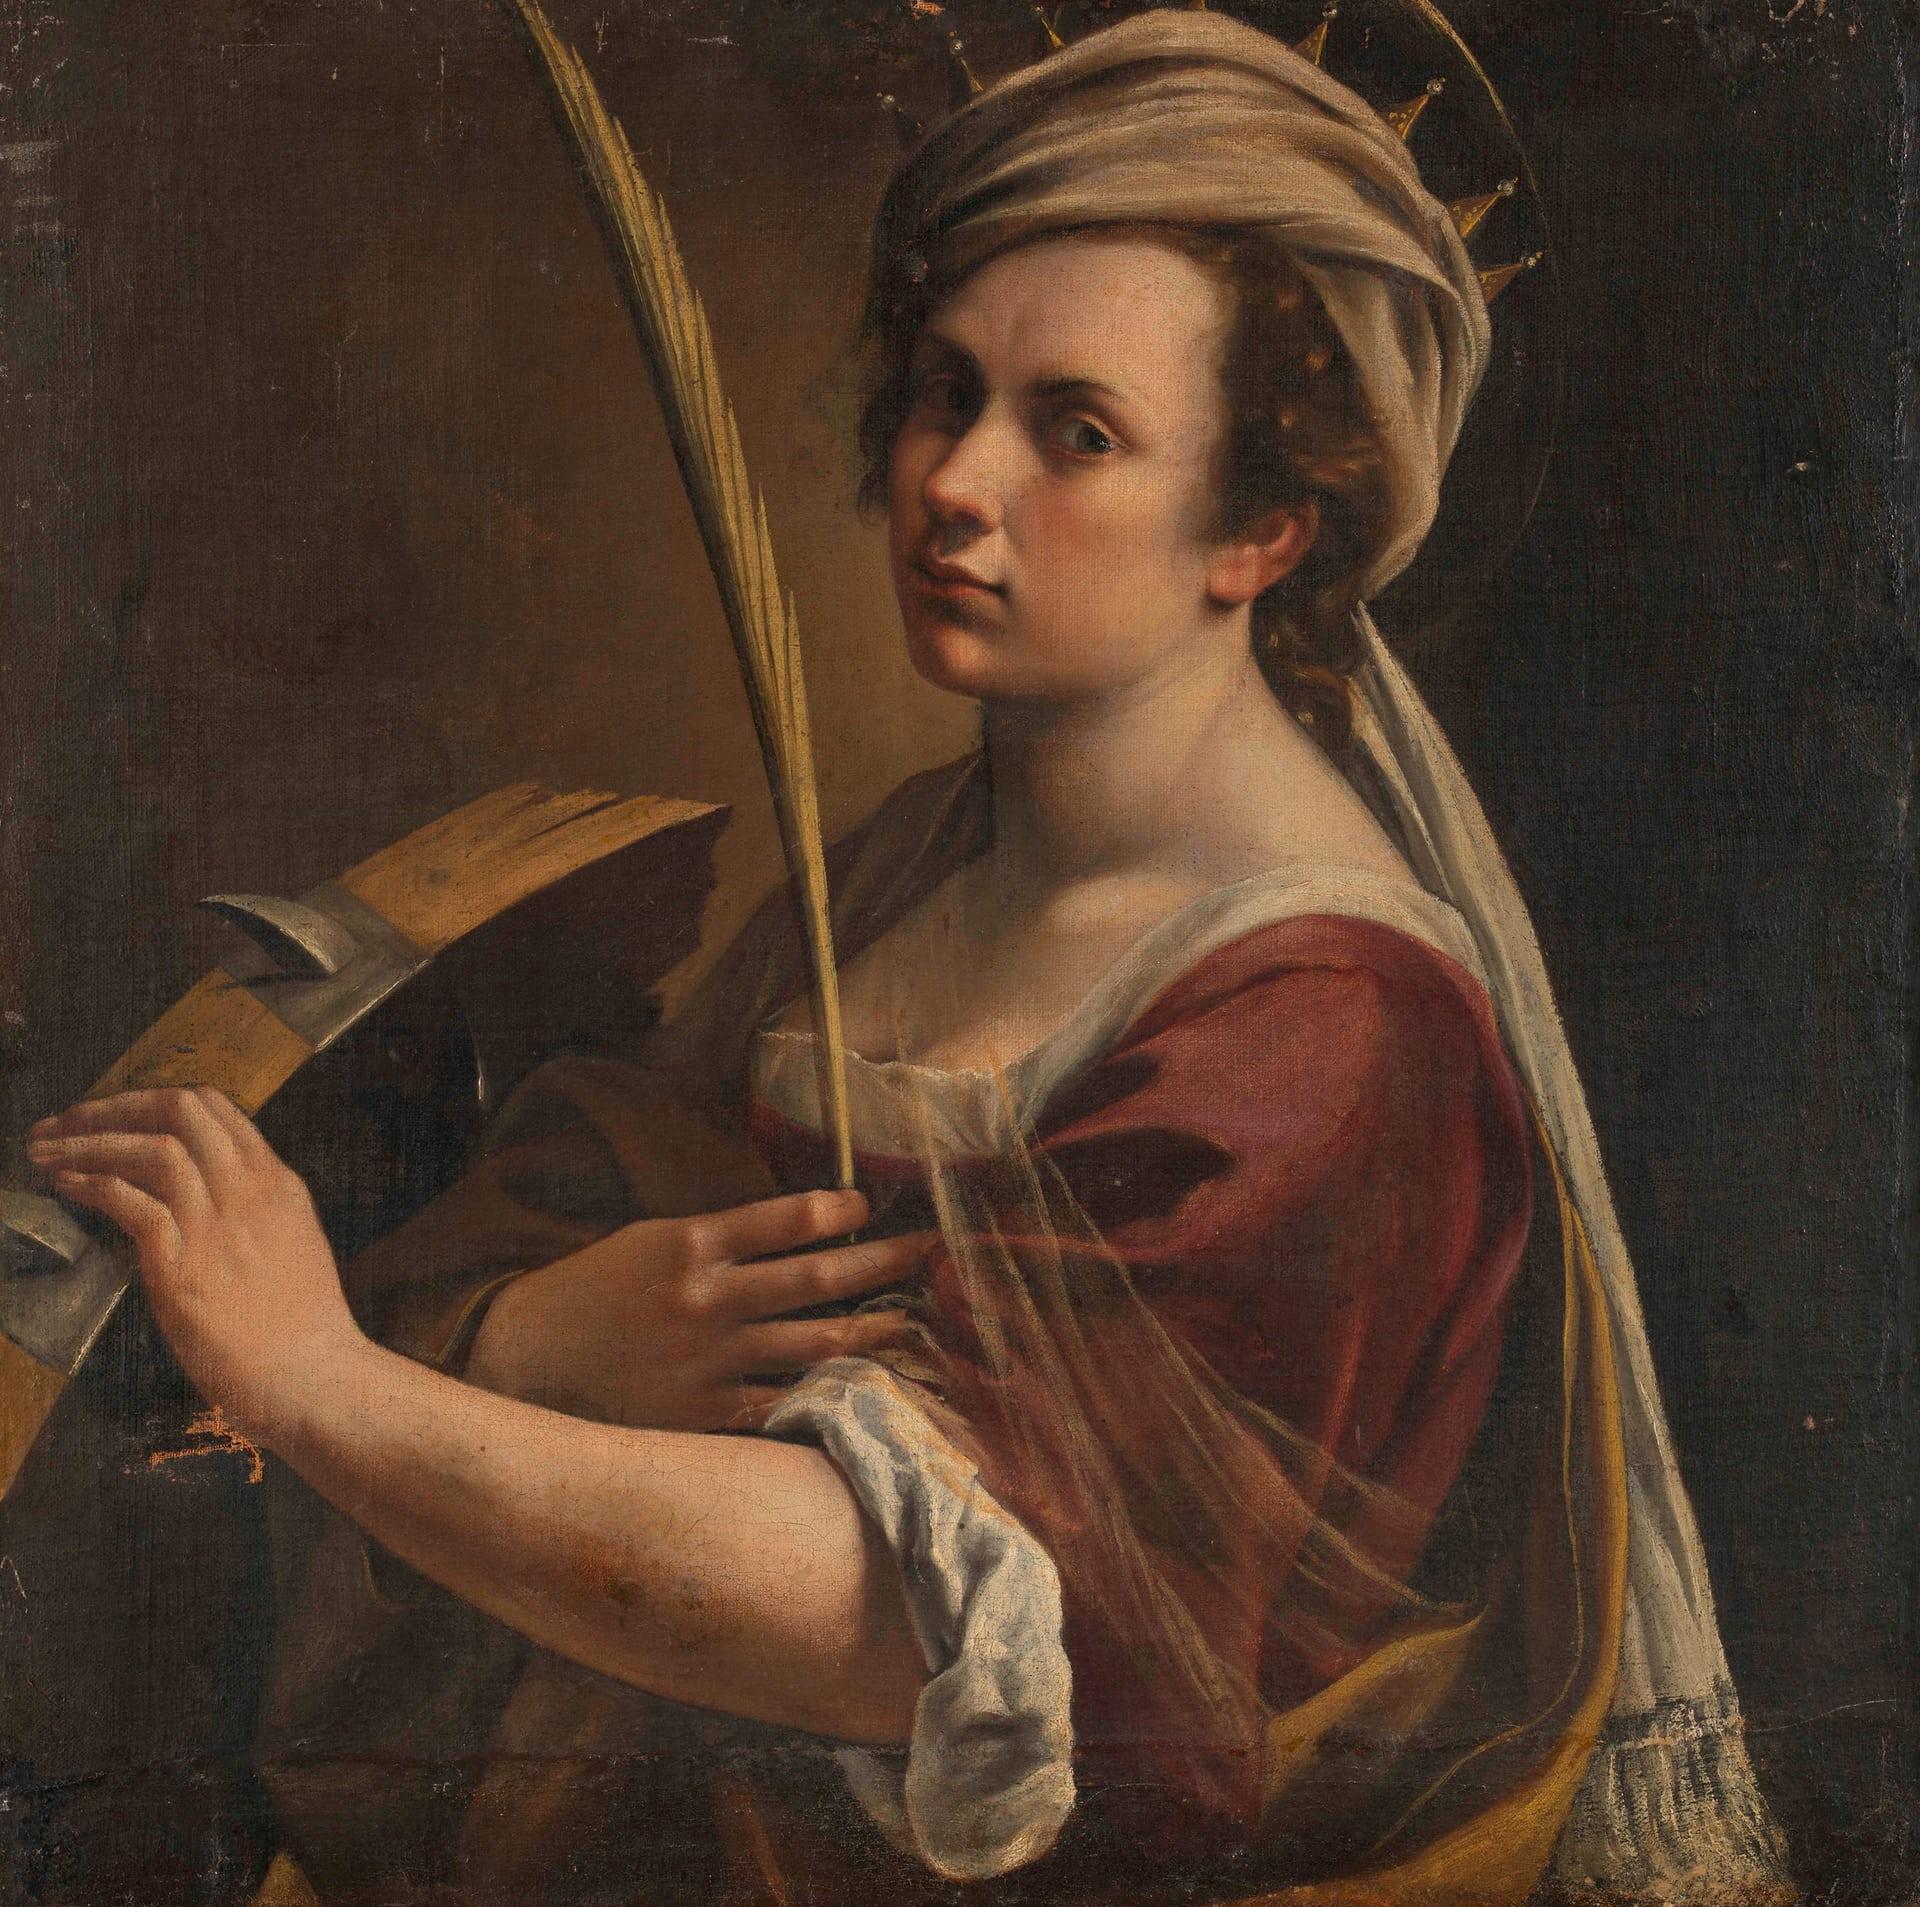 Self-Portrait as Saint Catherine of Alexandria by Artemisia Gentileschi